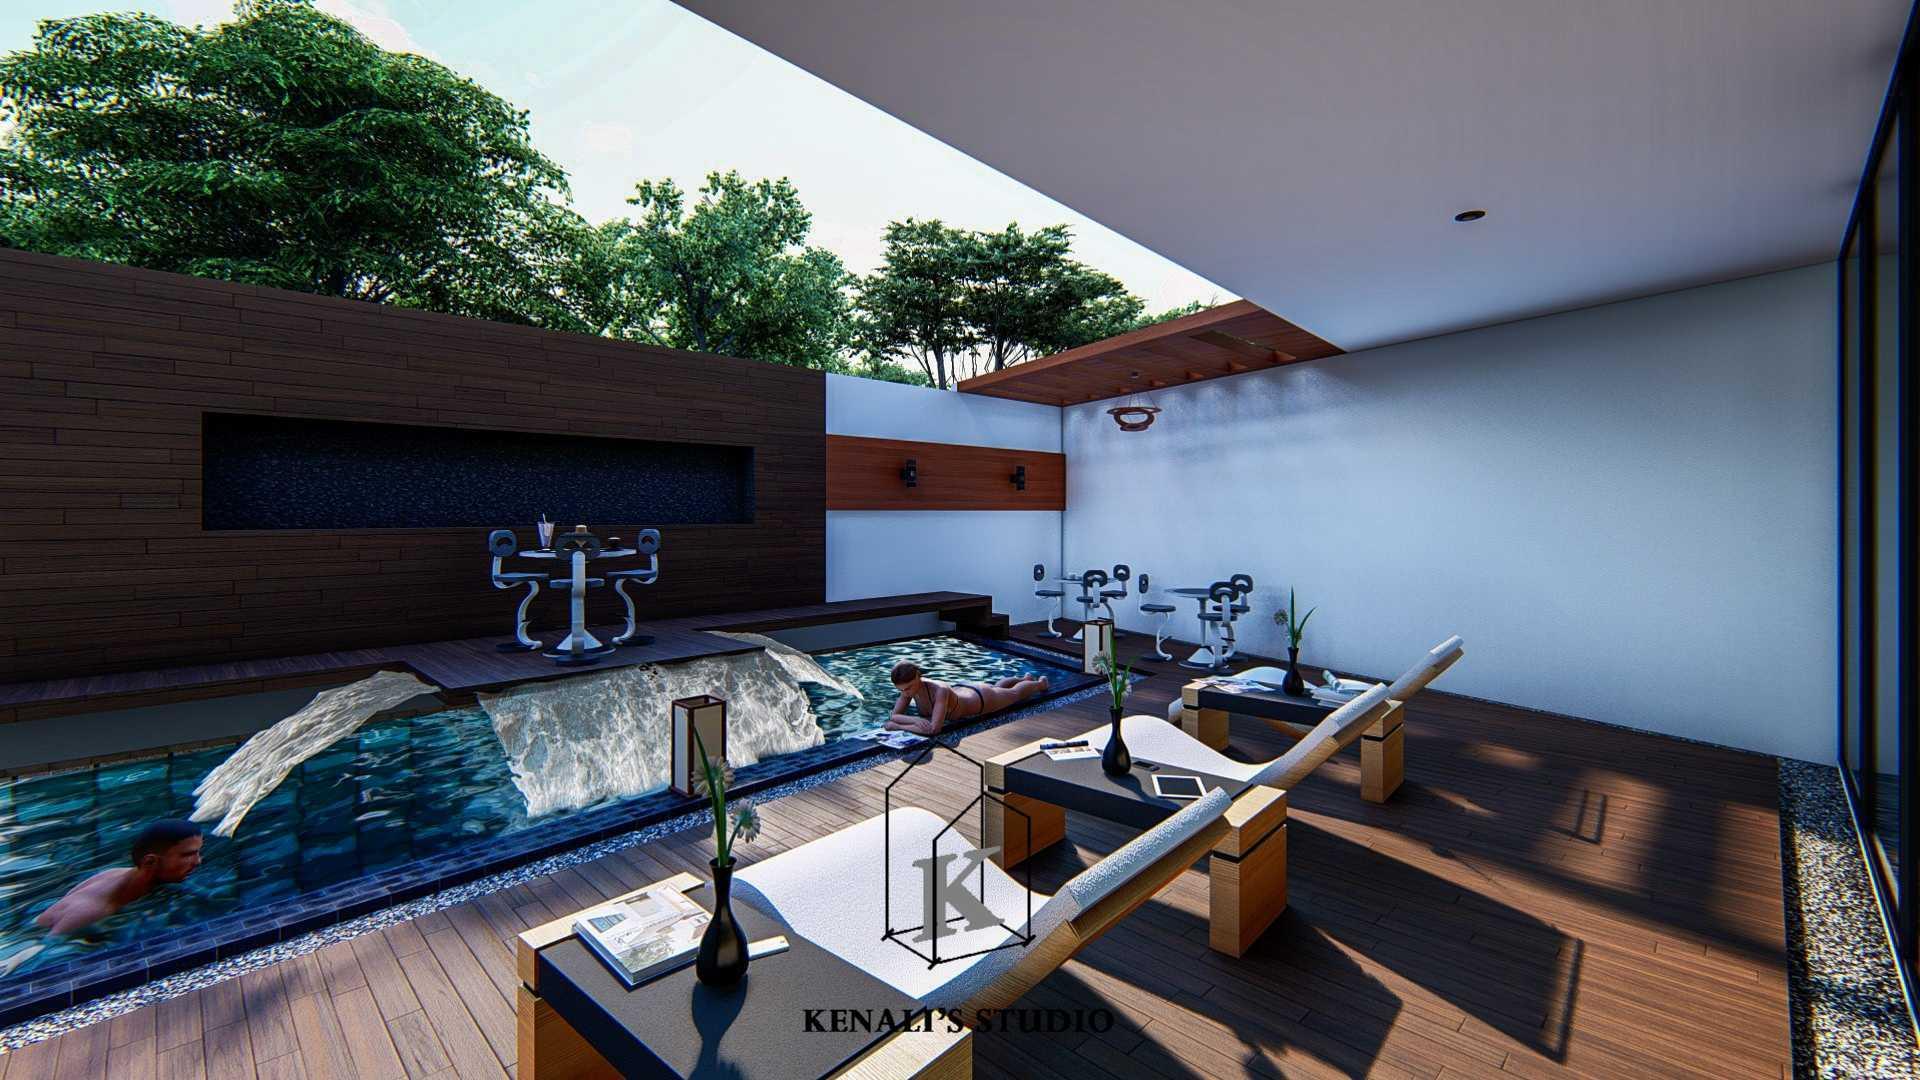 "Kenali's Studio ""hidden Treasure"" Project : Swimming Pool Kuwait Kuwait Kenalis-Studio-Hidden-Treasure-Project-Swimming-Pool  72940"